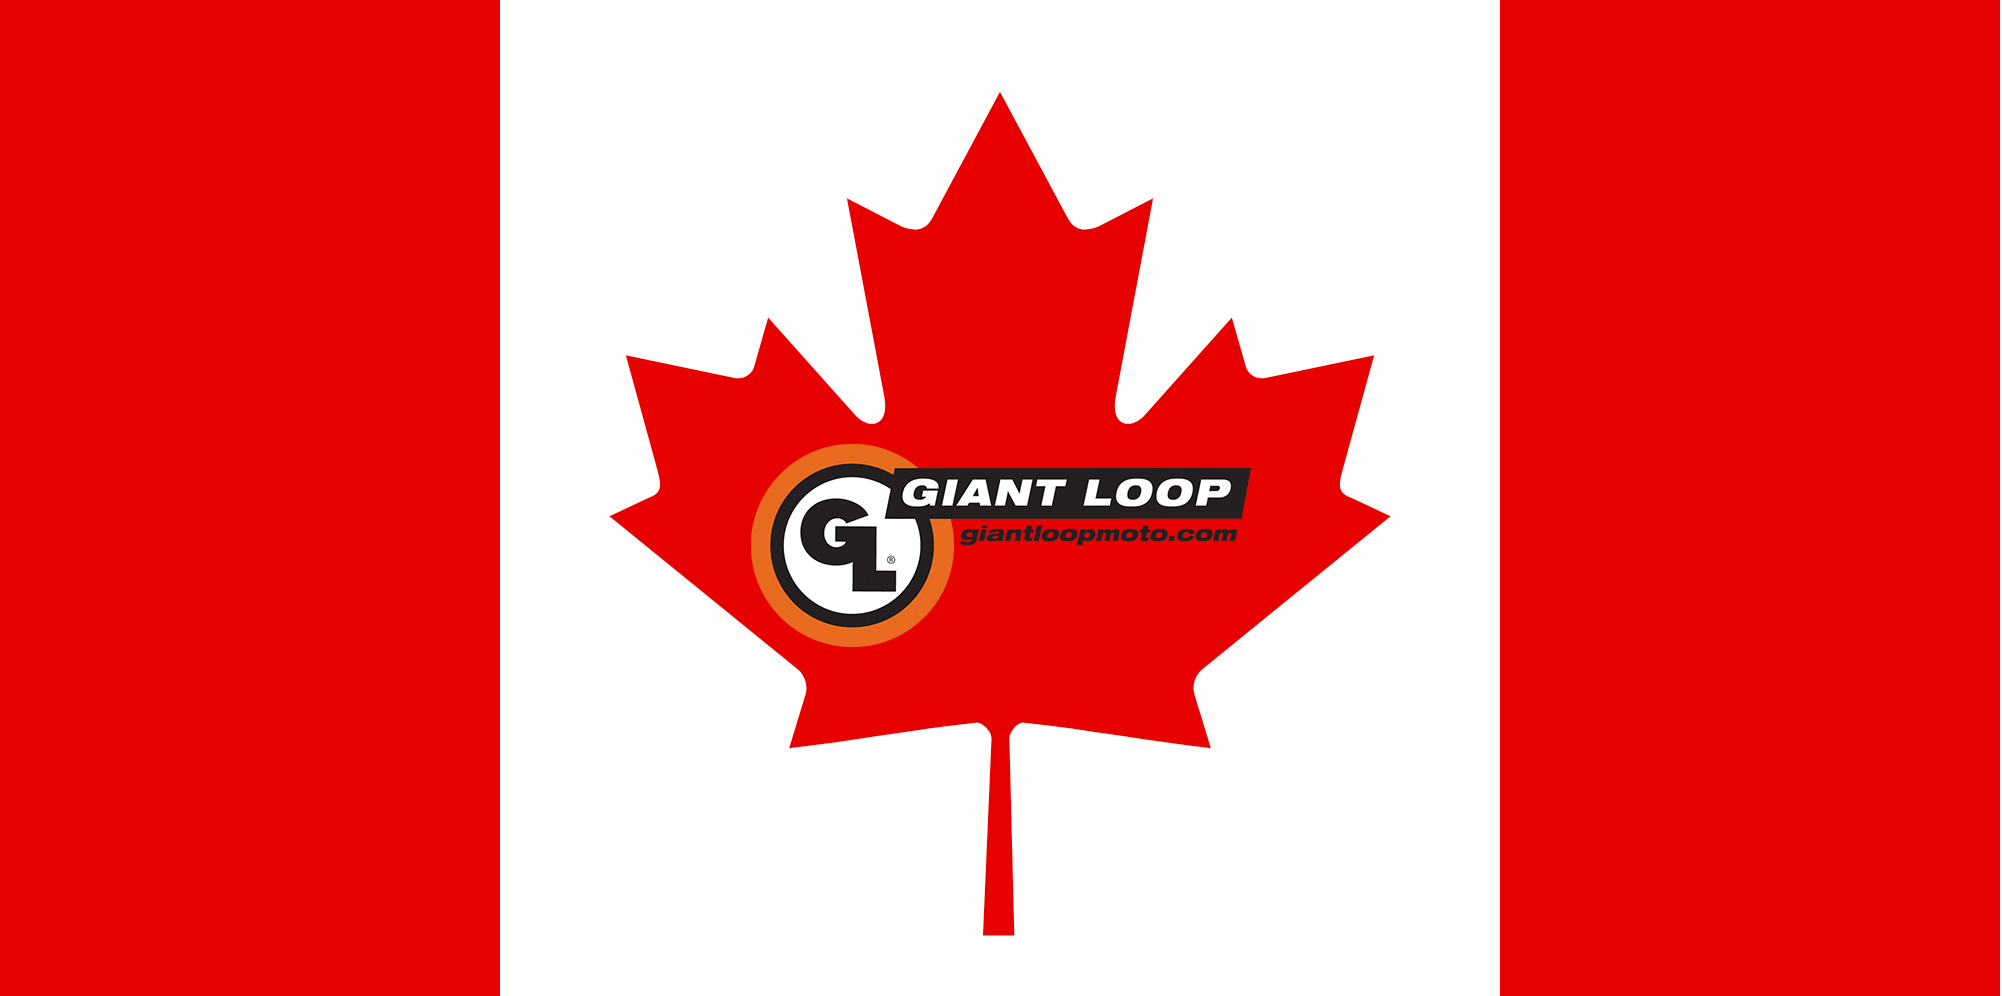 Giant Loop Canada